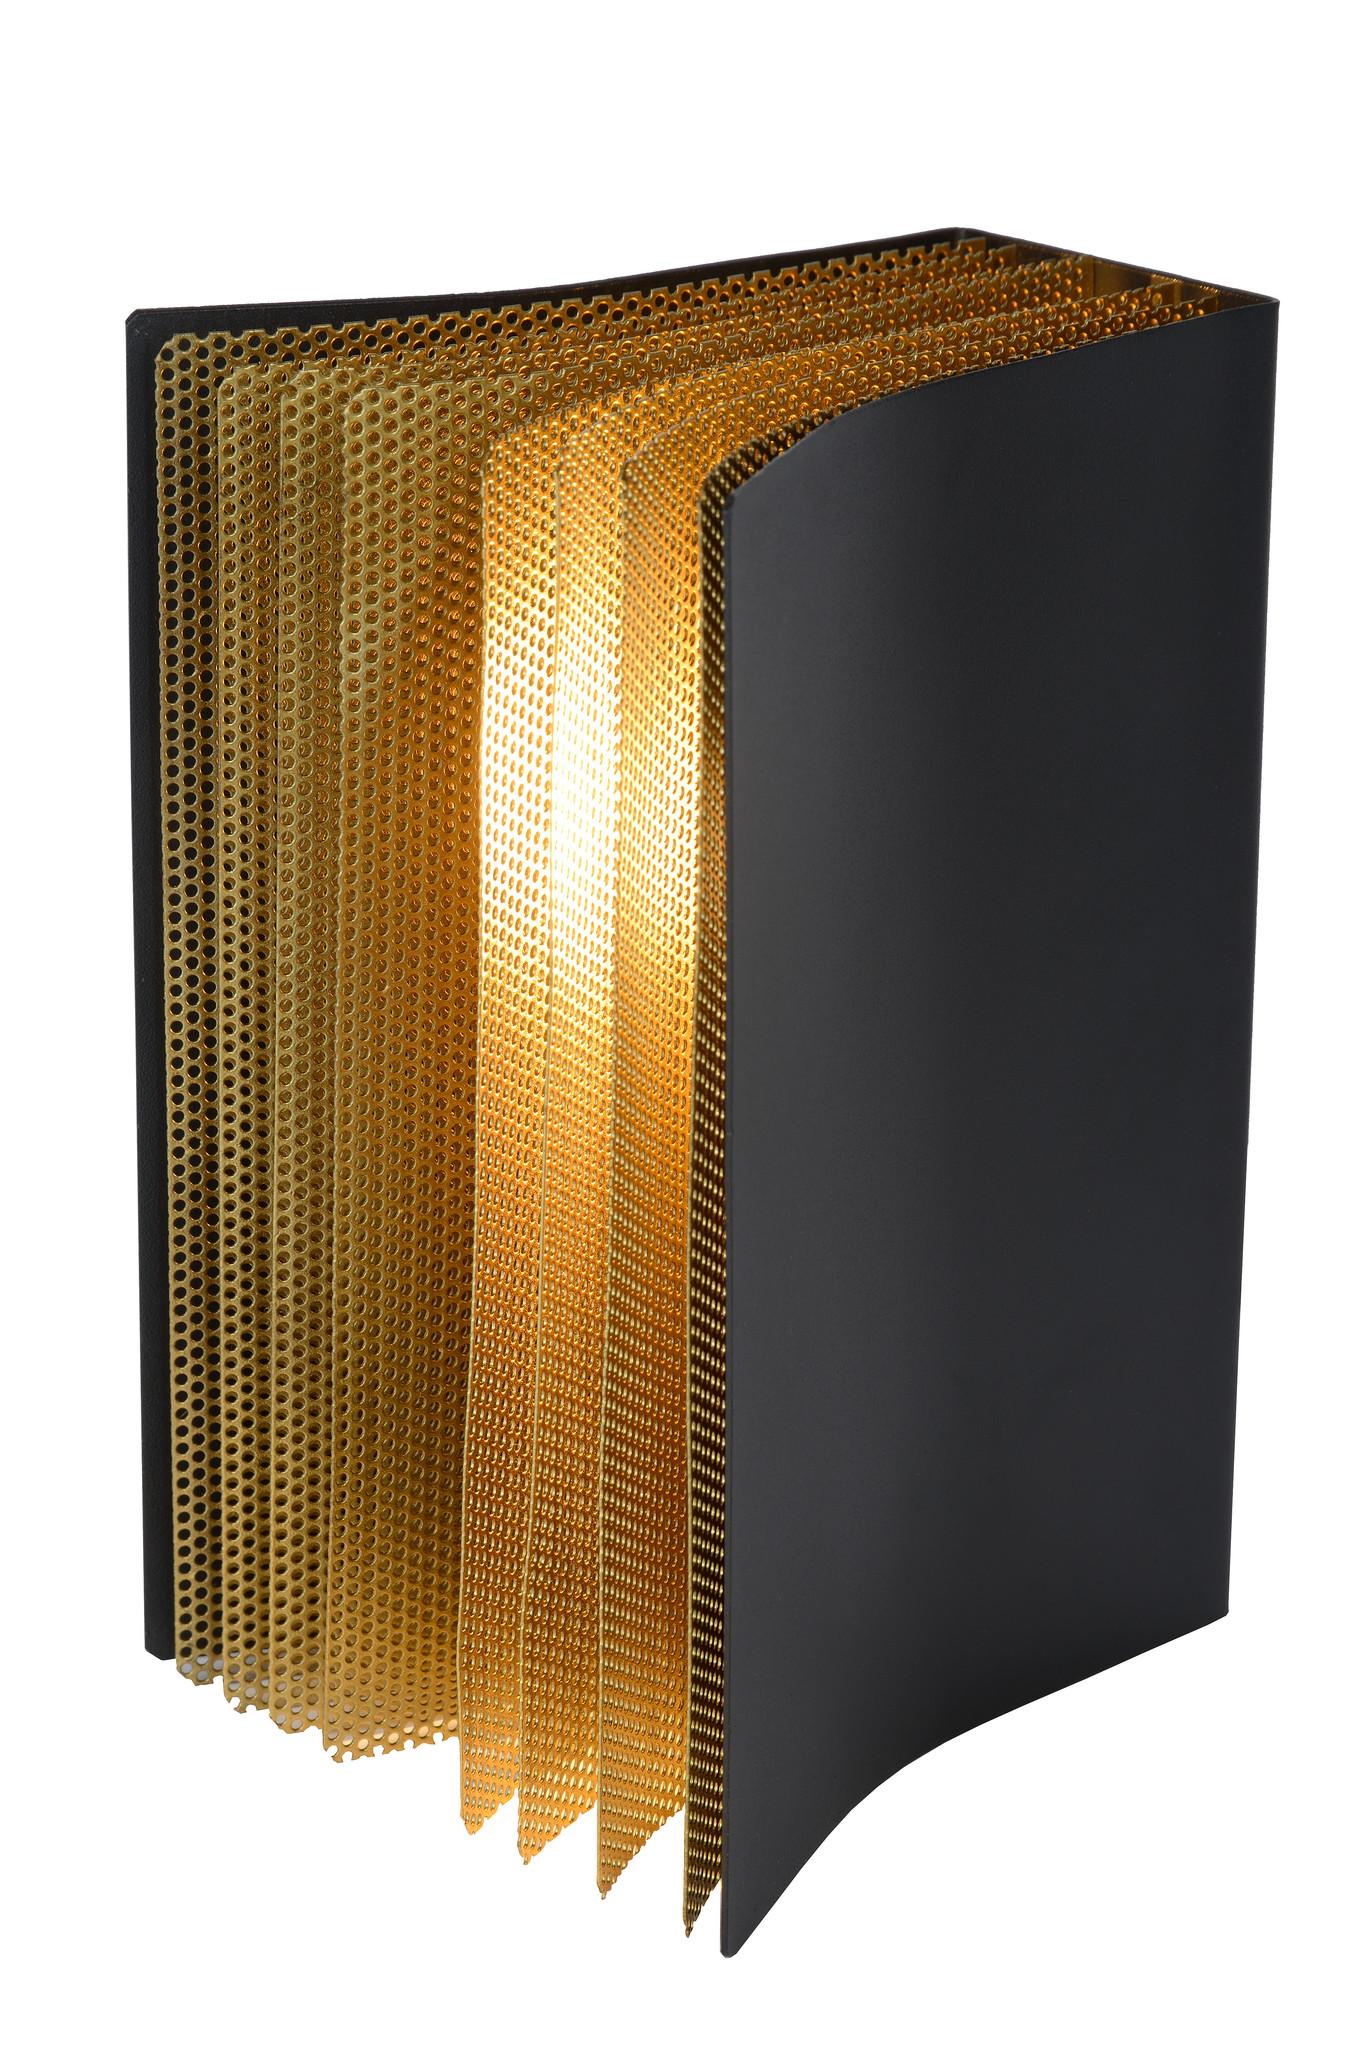 Lucide LIVRET Tafellamp E14/40W Zwart / Goud